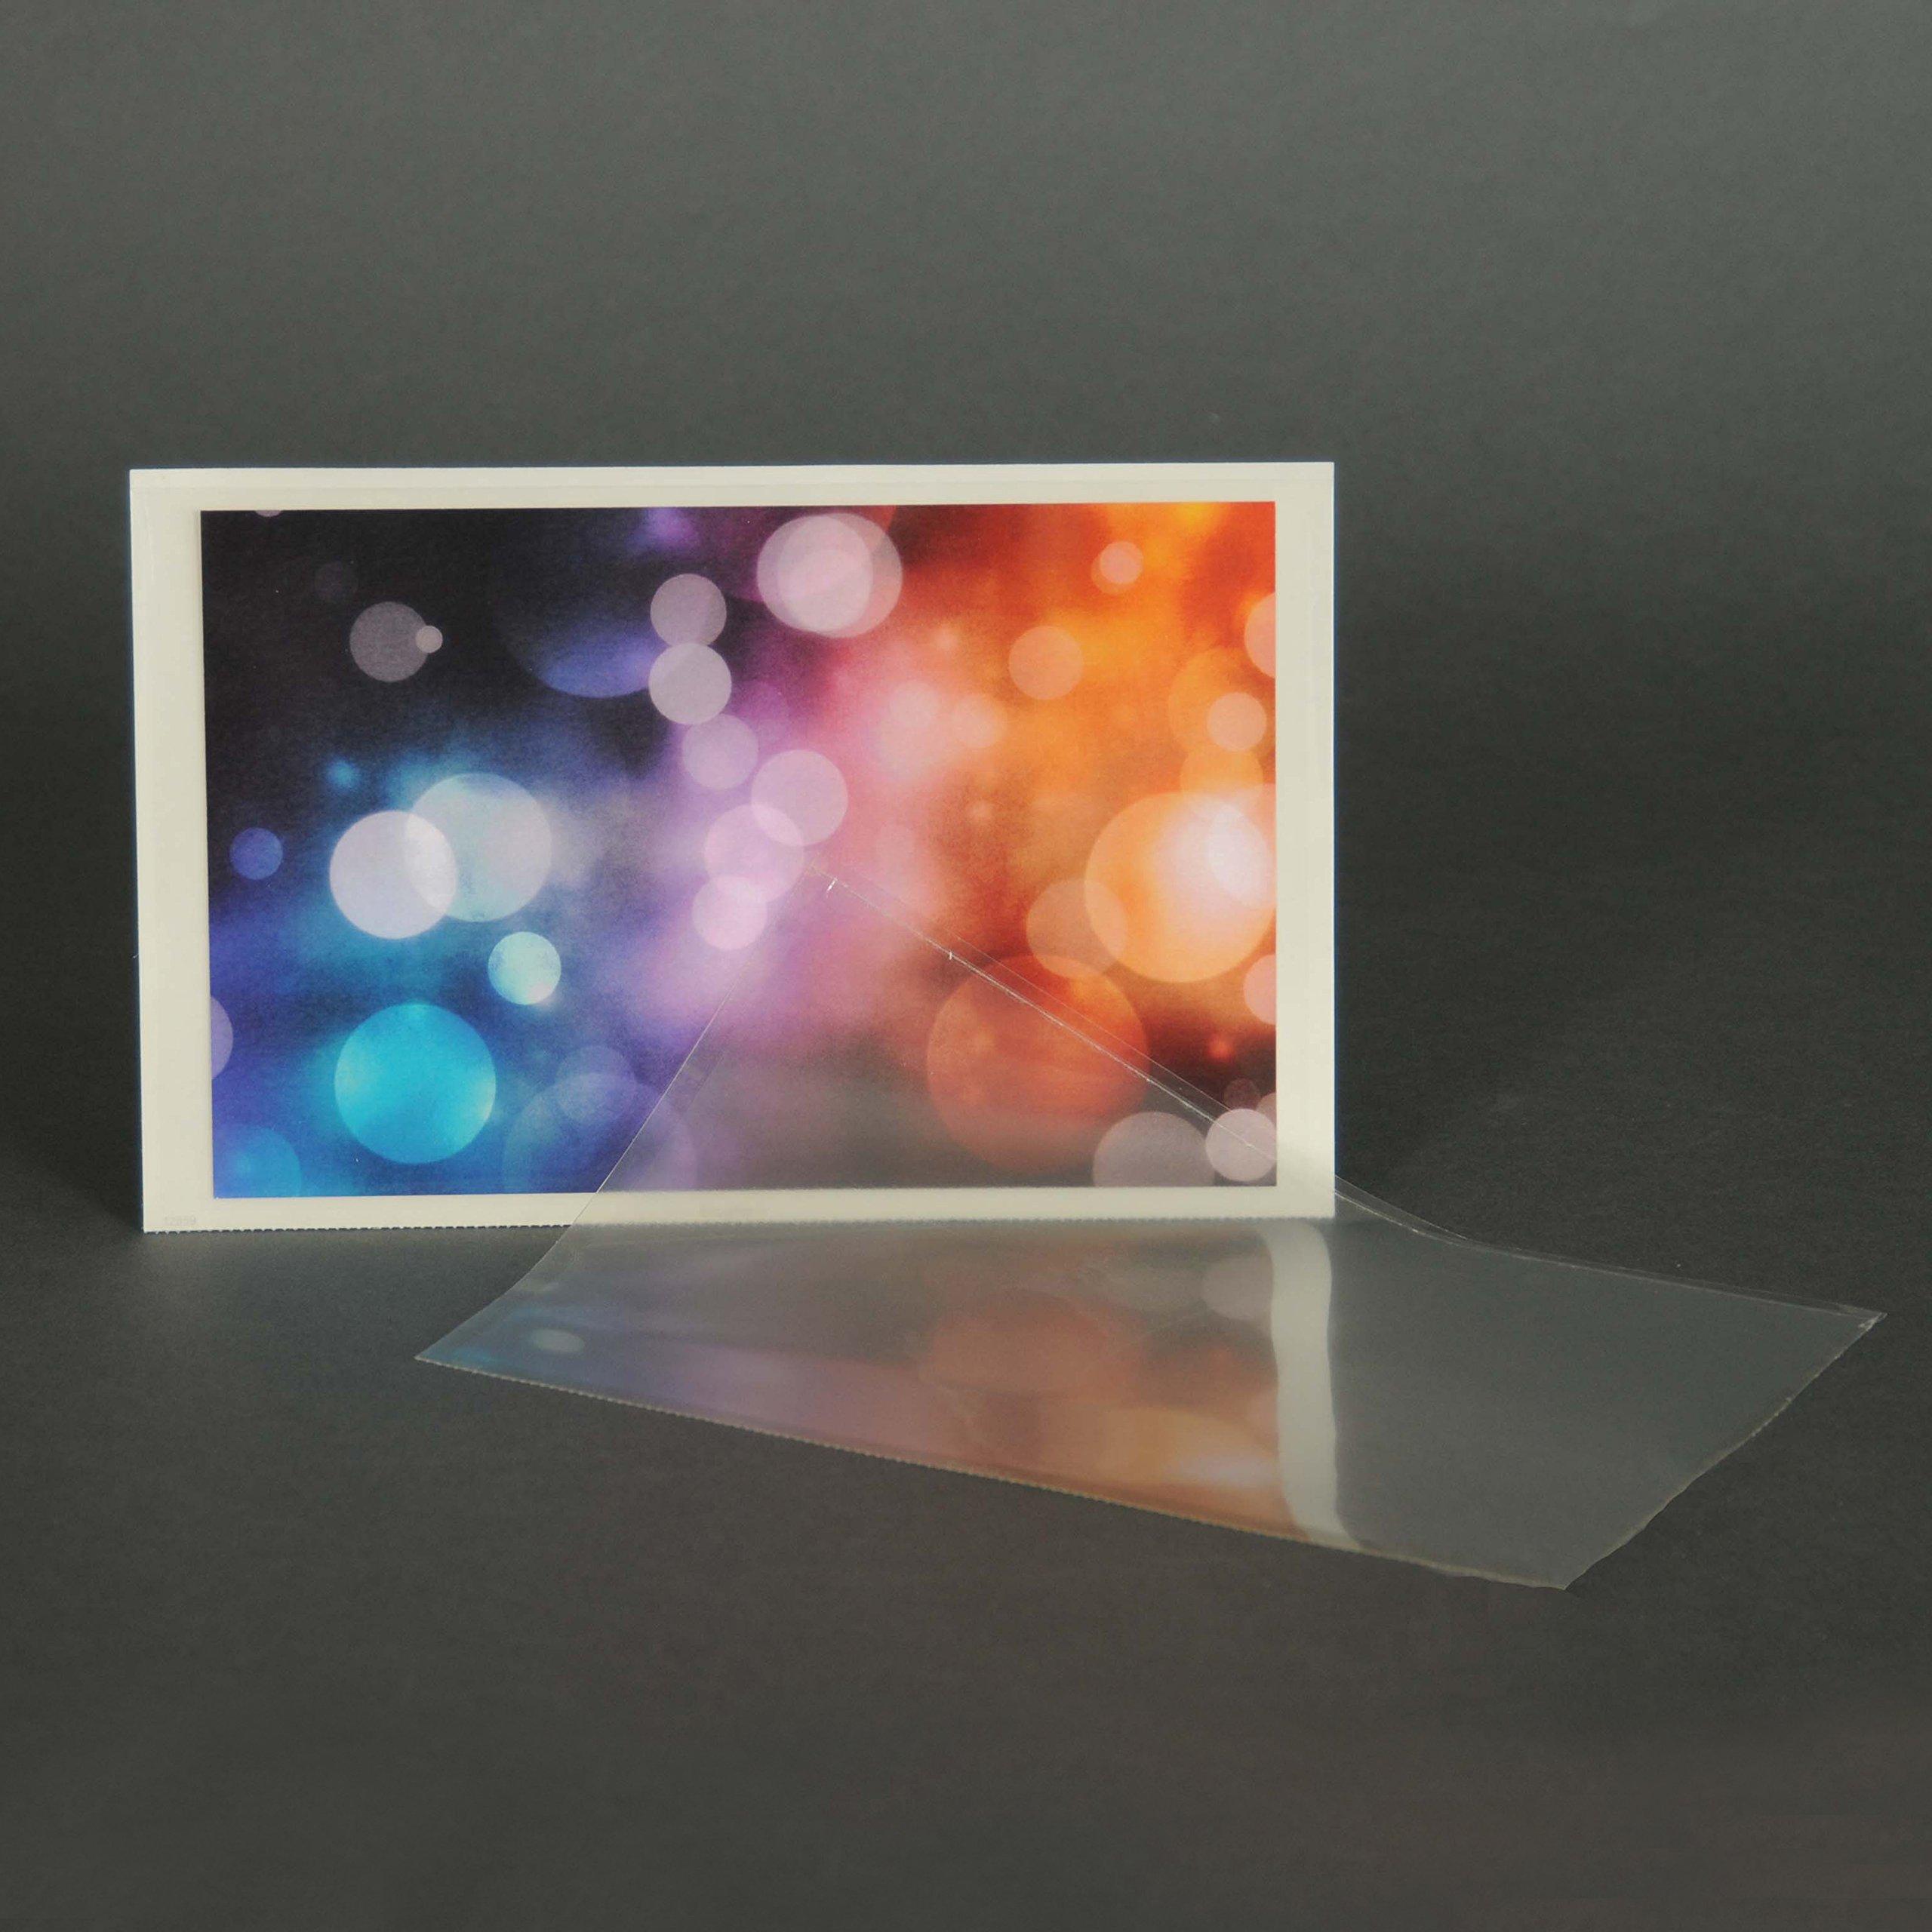 Adhesive Poly Half-Page Pocket - Pack of 500 Pockets